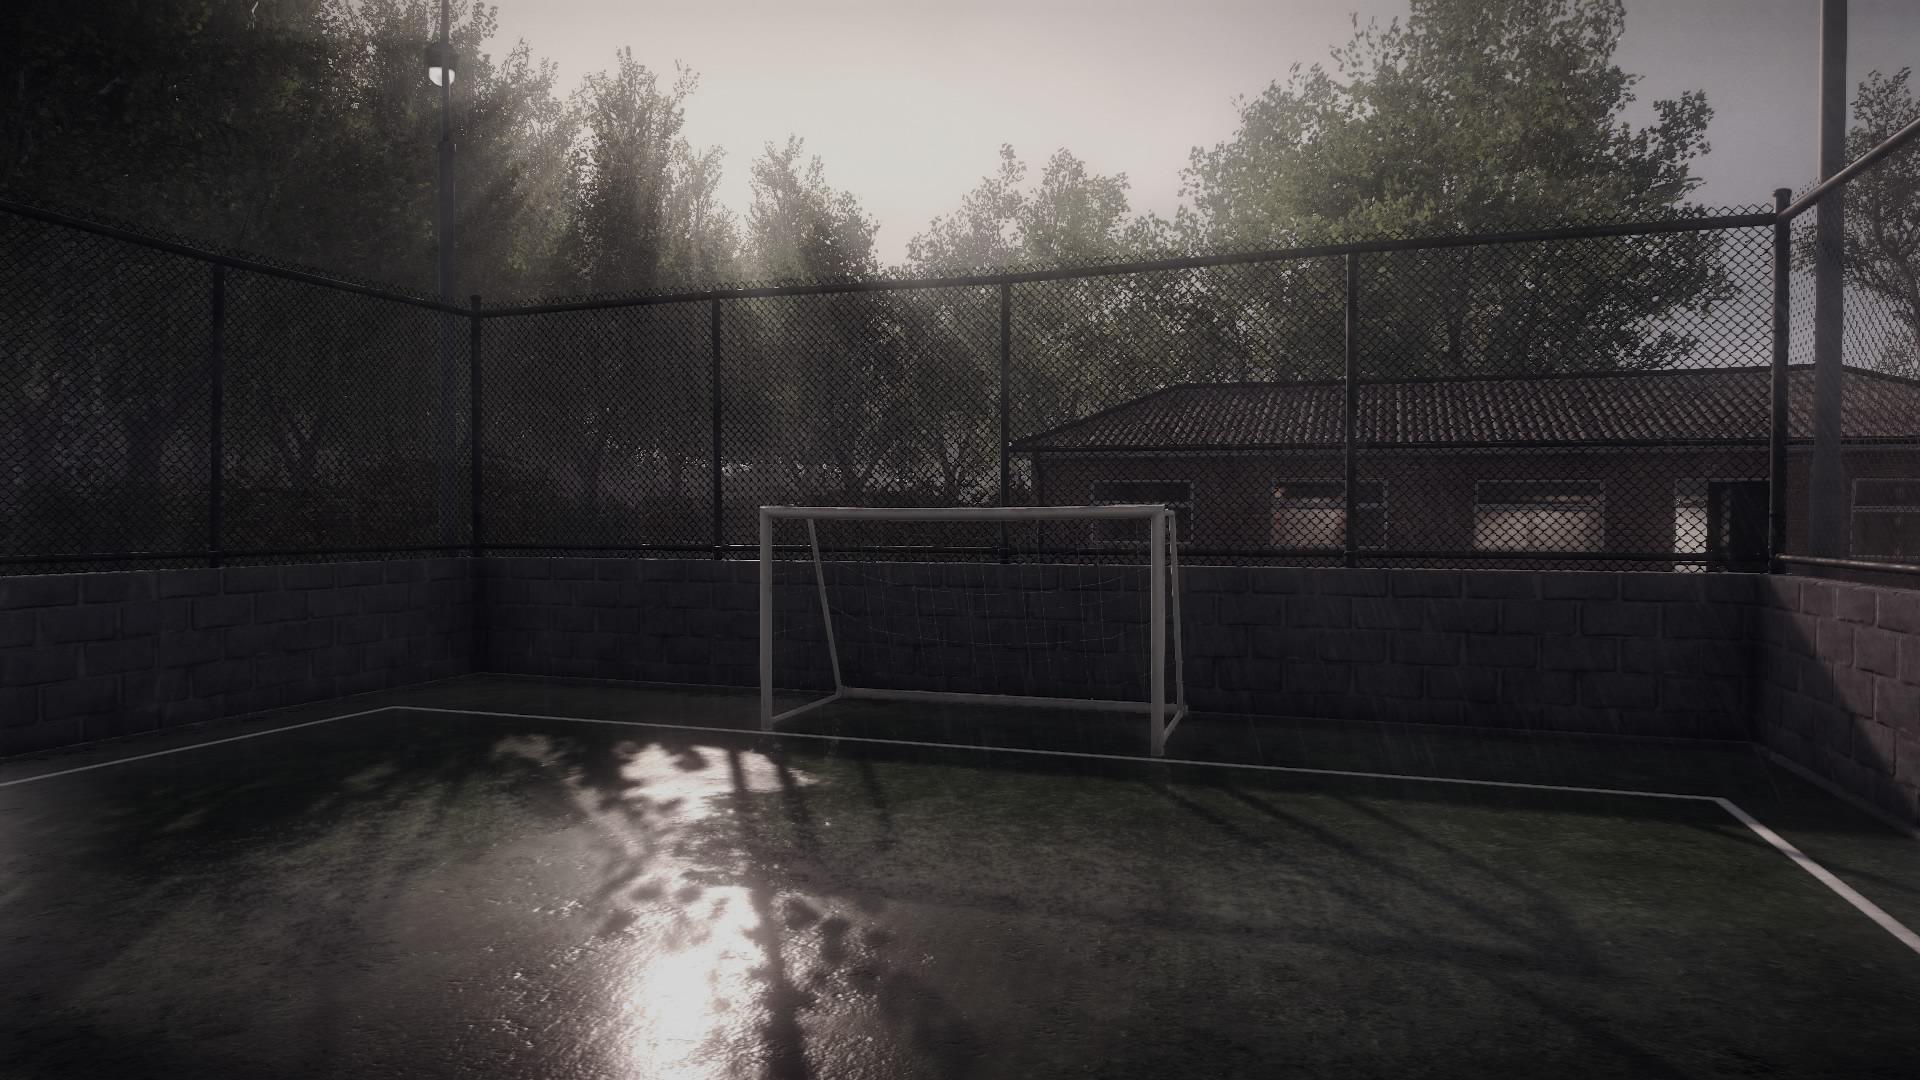 Spielausfall wegen Regens.